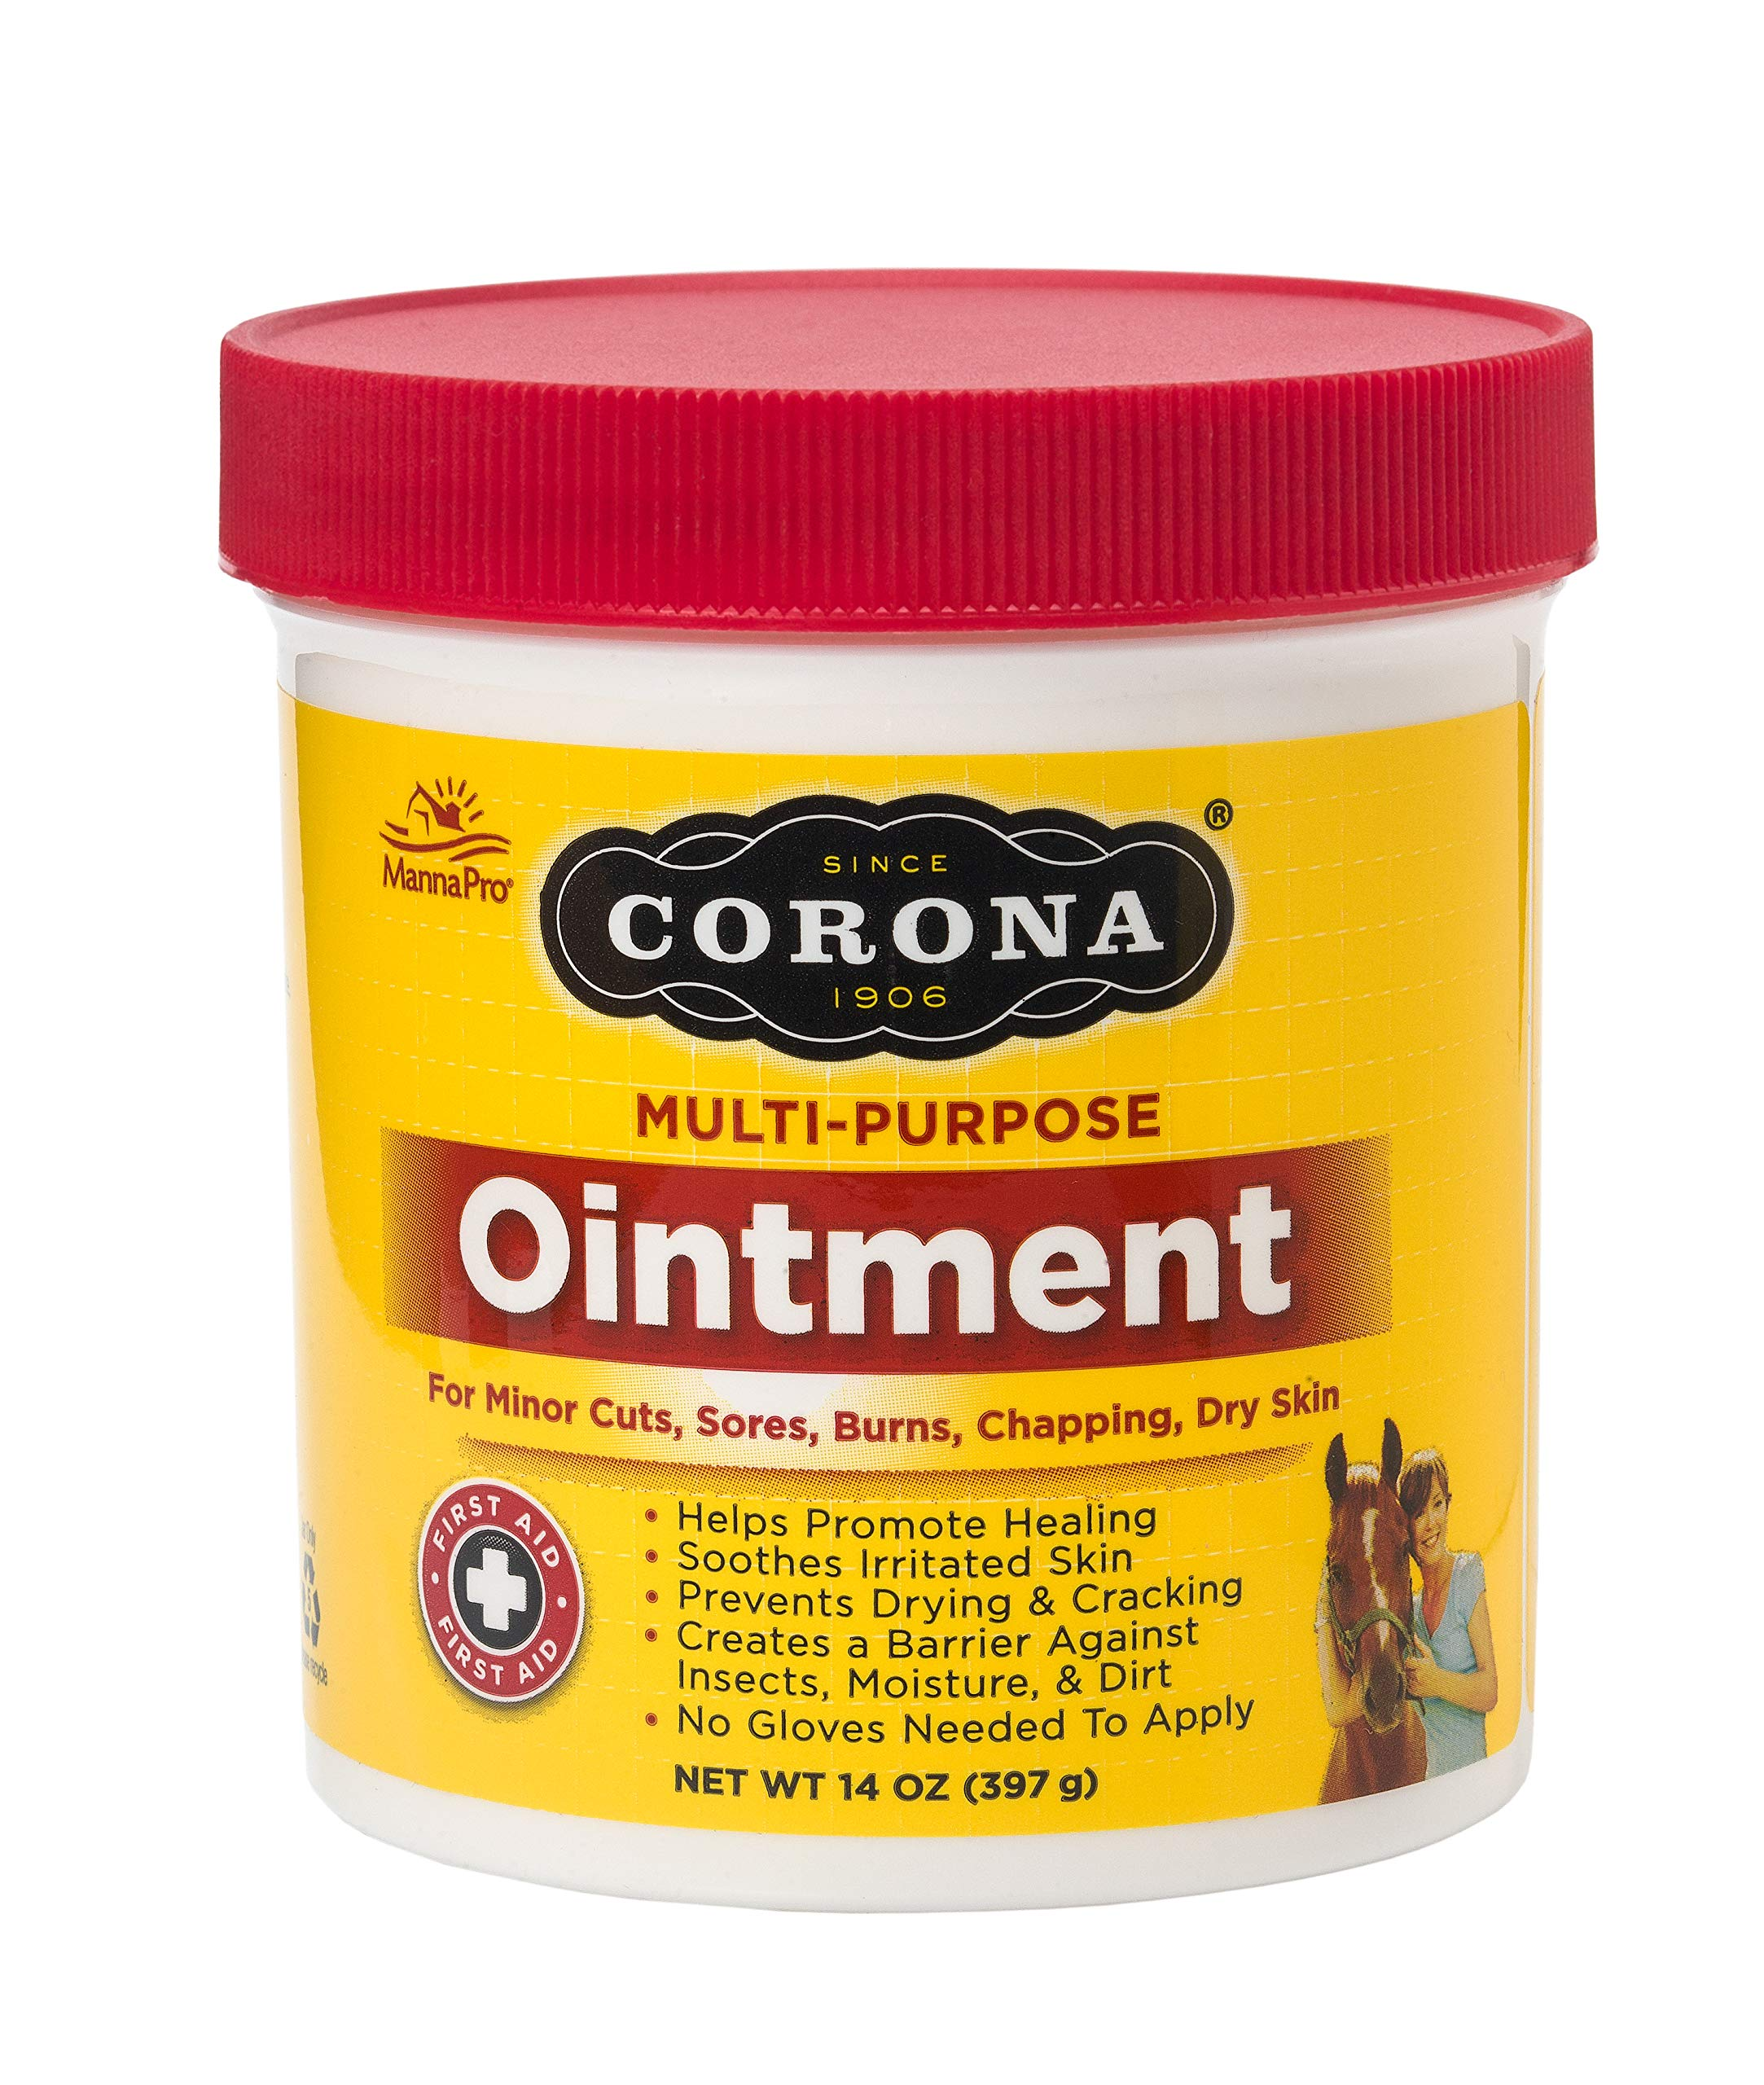 Manna Pro Corona Ointment 14 oz, jar by Manna Pro